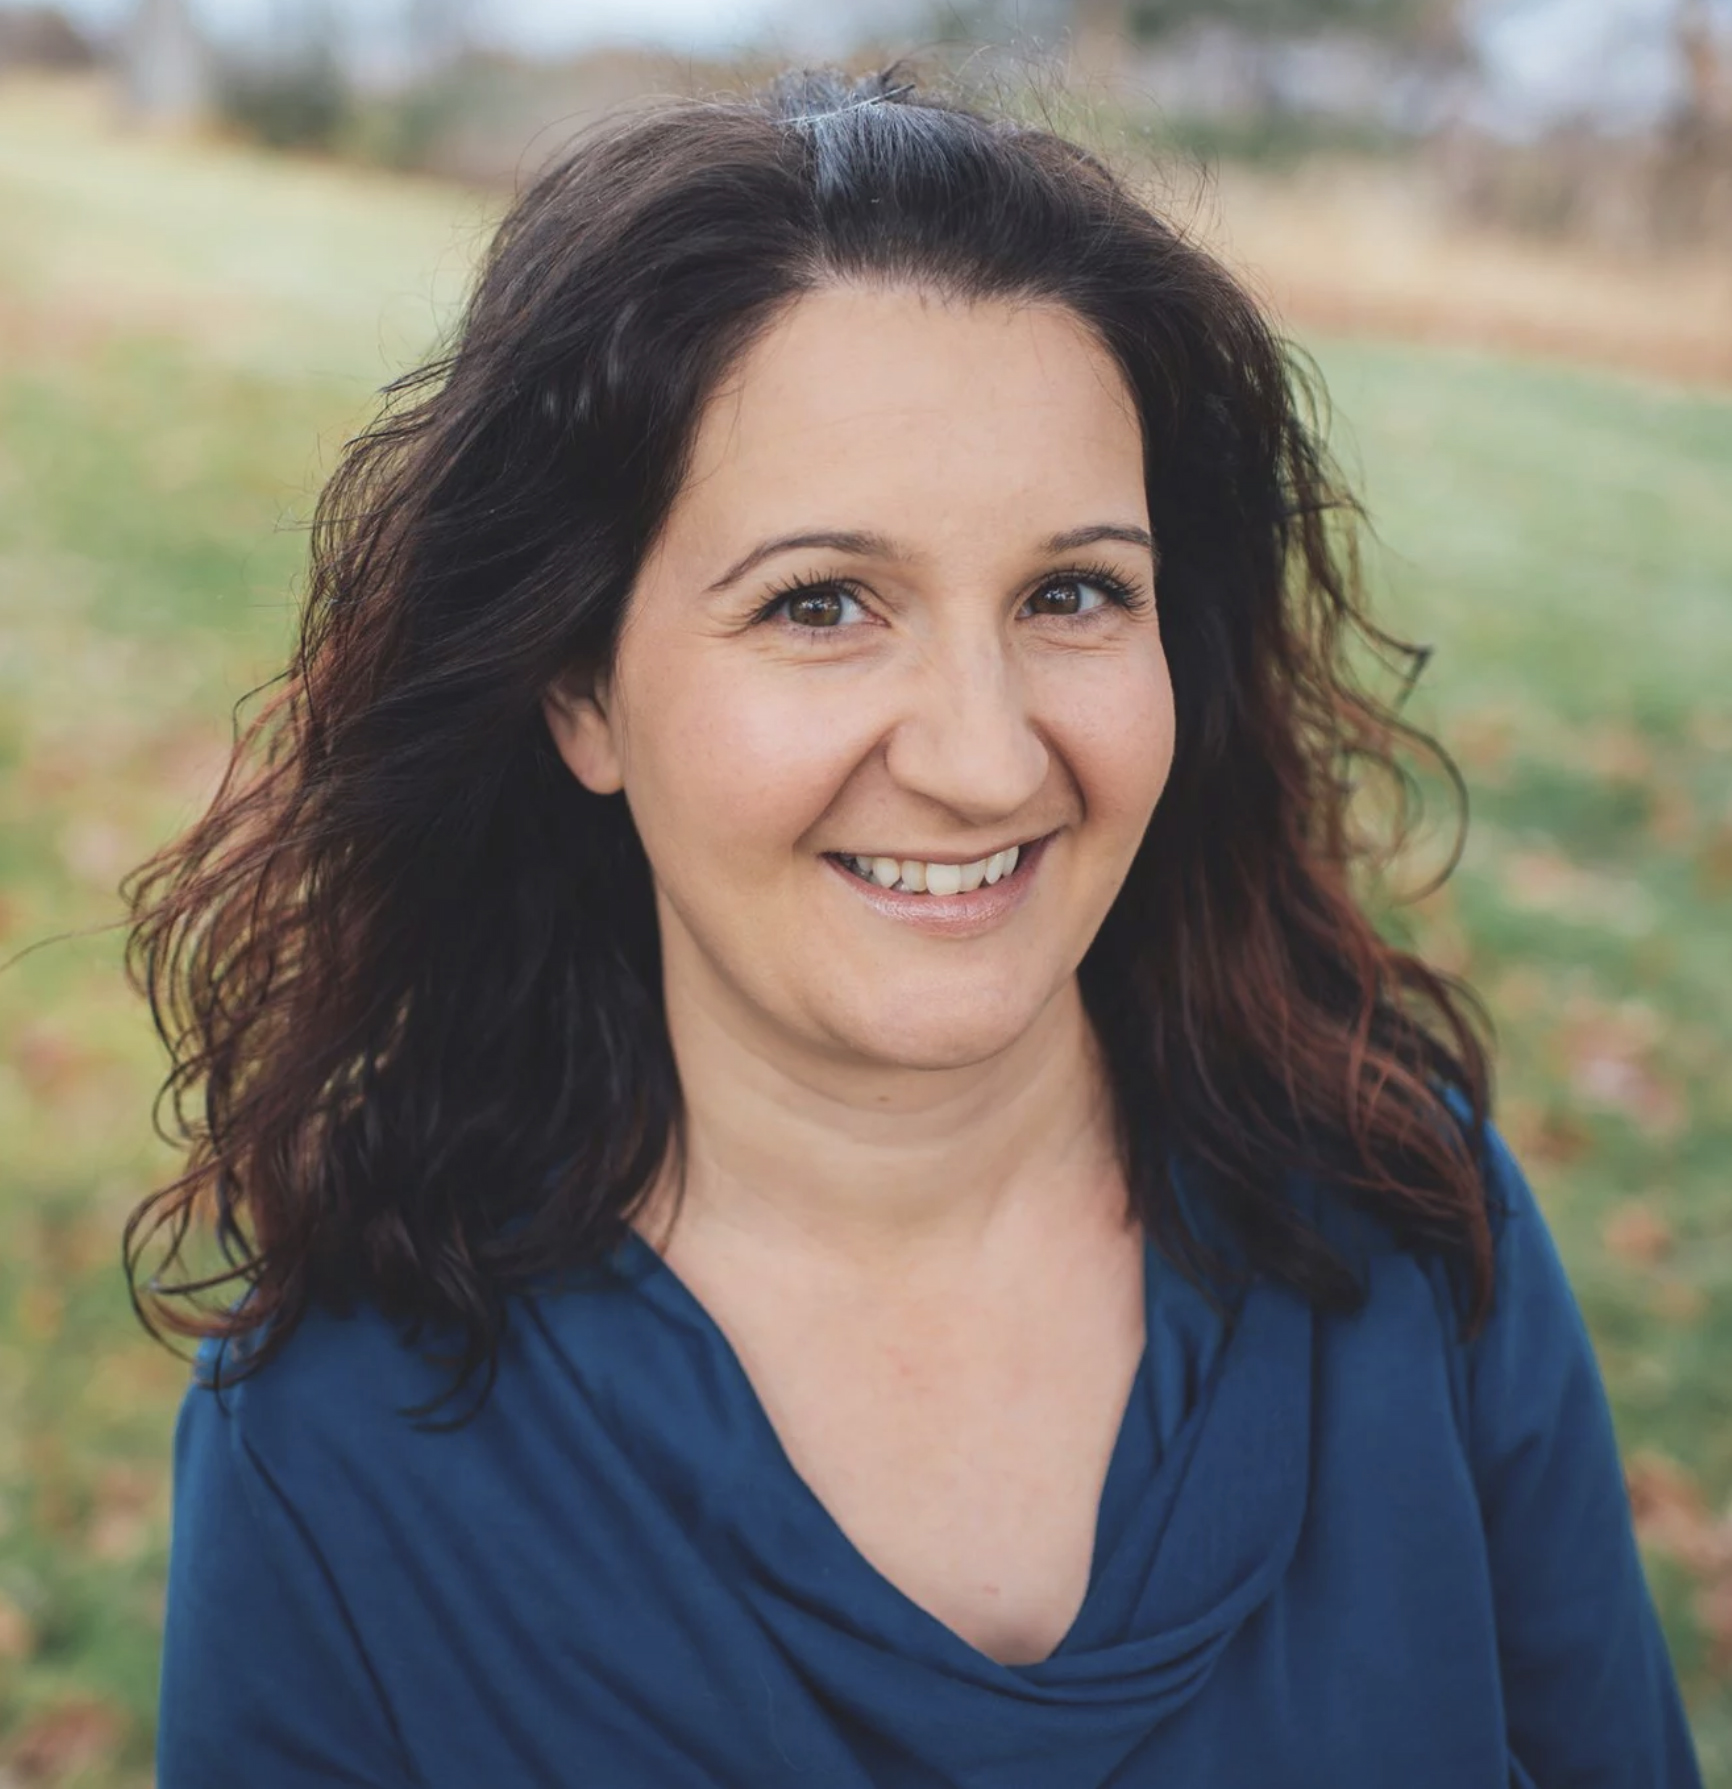 Clinical Counsellor - Stefanie